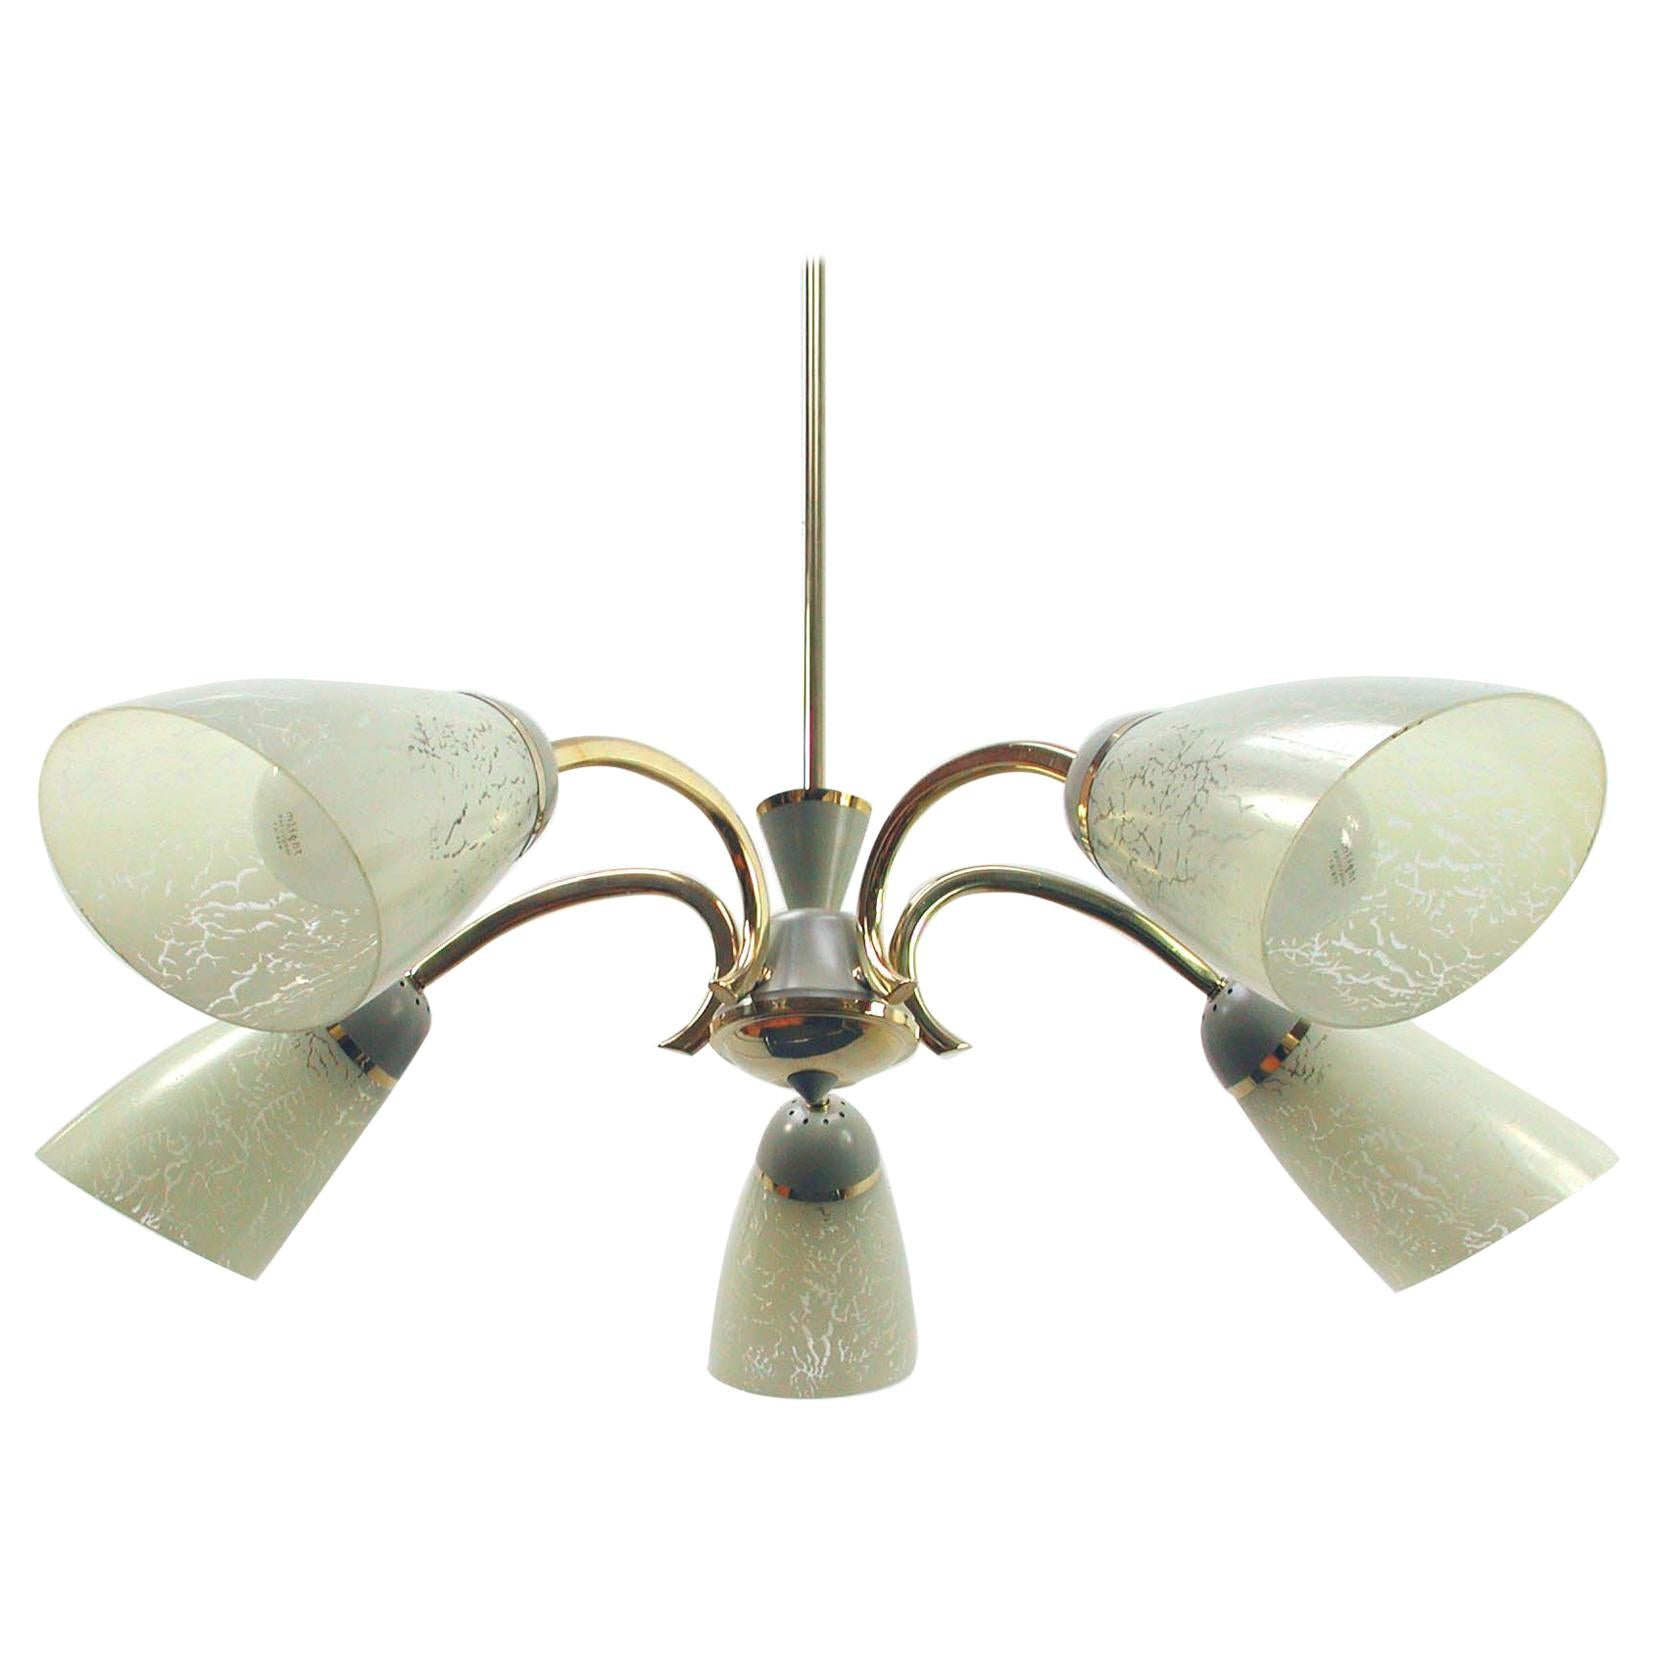 Midcentury German Brass and Glass Sputnik 5-Light Chandelier, 1950s